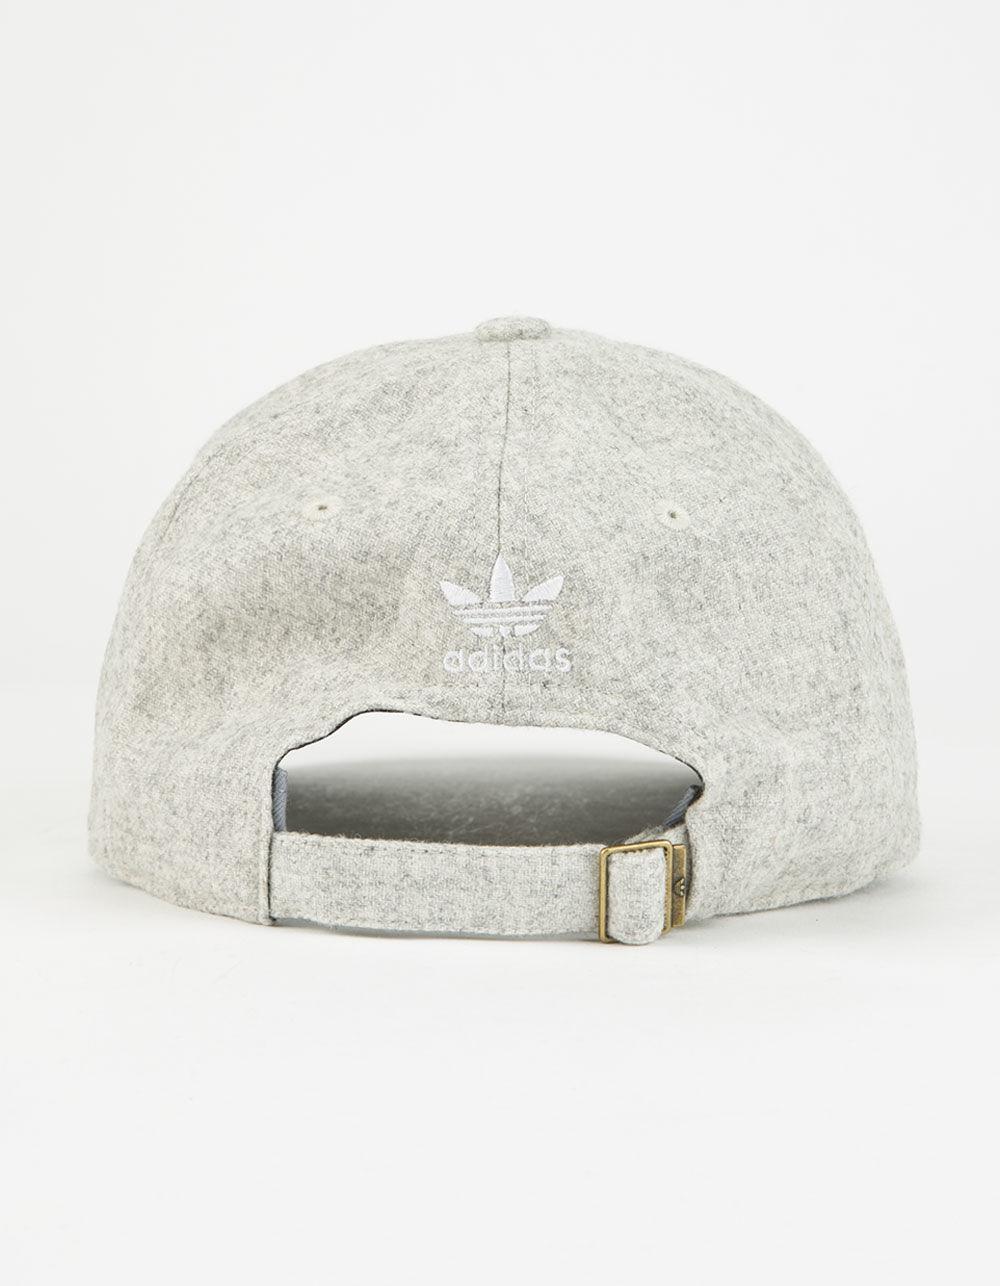 detailed look 13d04 c7075 Adidas Originals White Originals Relaxed Plus Womens Strapback Hat Lyst. View  Fullscreen ...